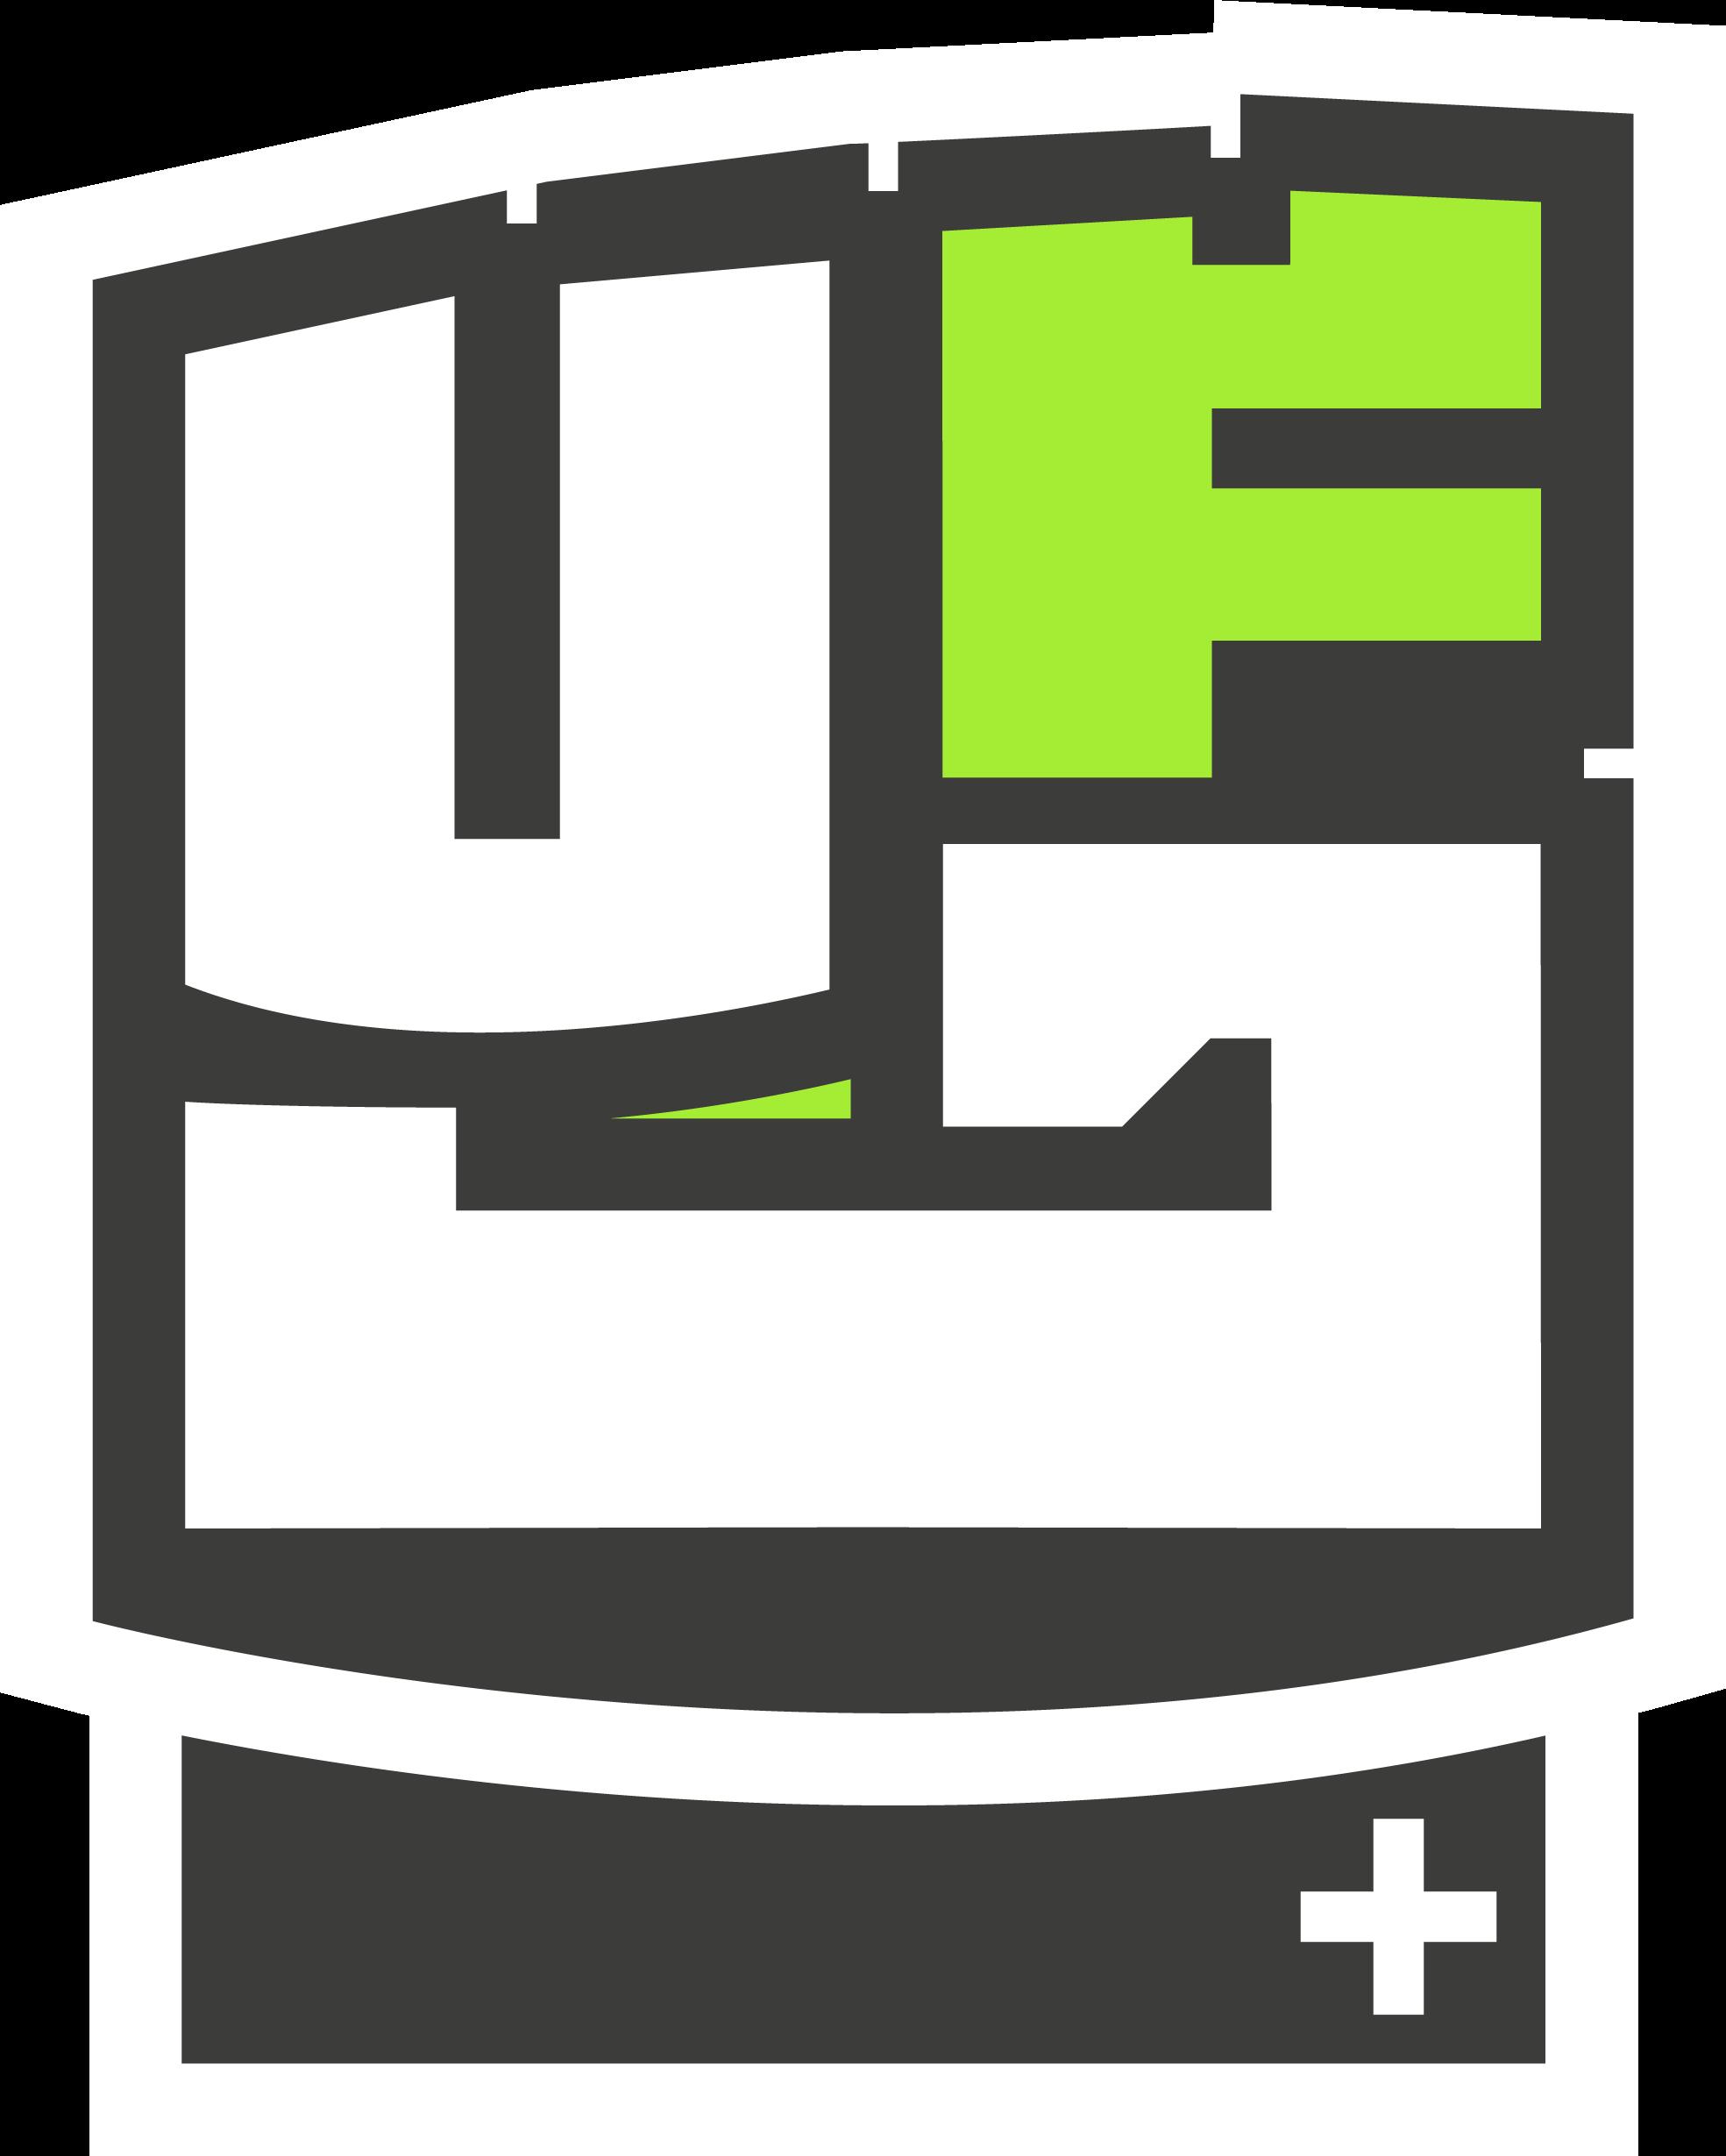 University Fighting Games